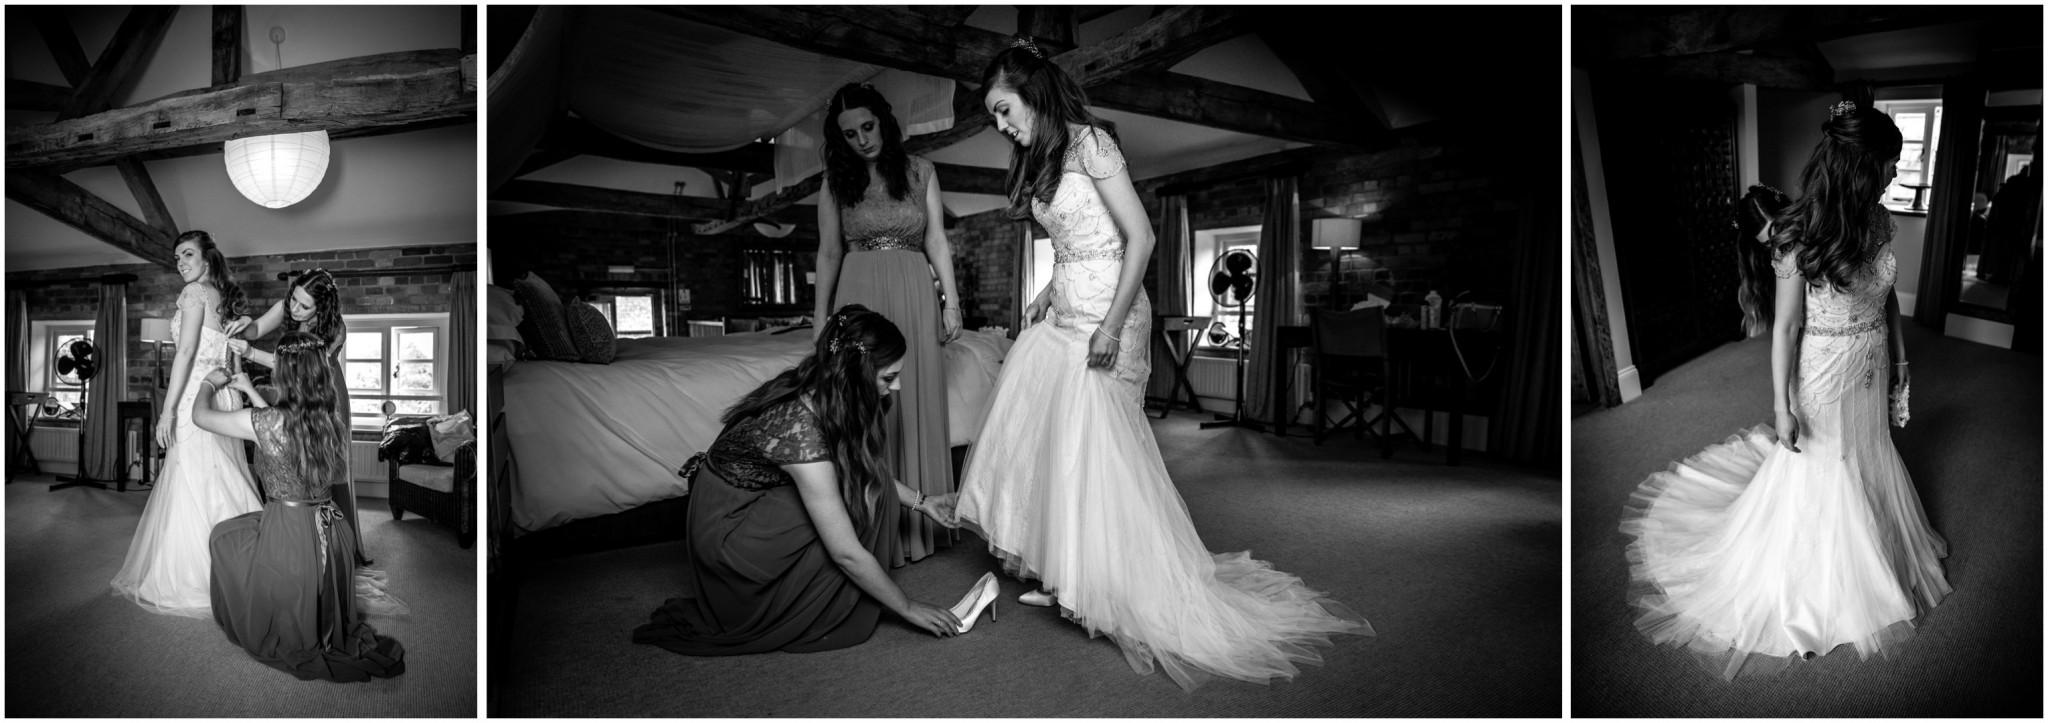 Wasing Park Wedding Photography Wedding Dress shots